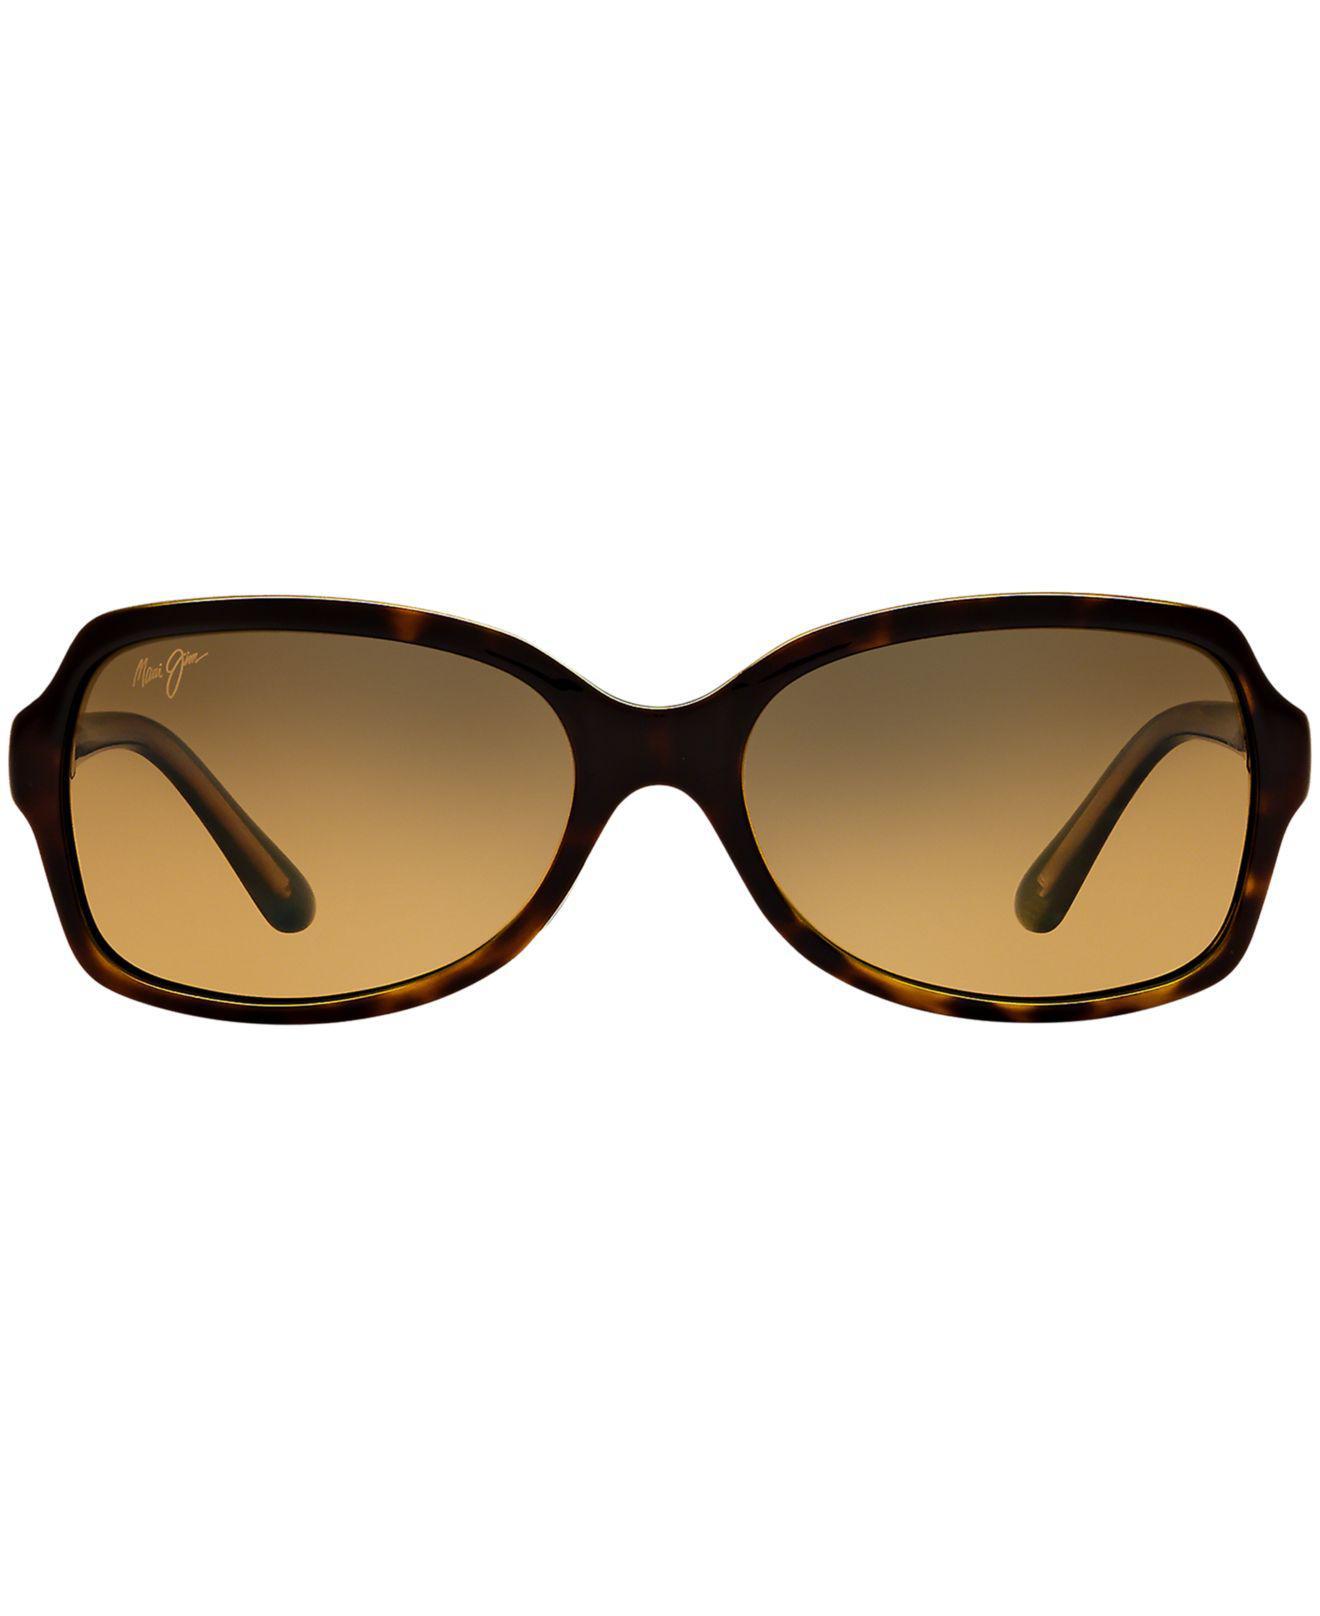 8b2d953914 Maui Jim Sunglasses, 700 Cloud Break 56 in Black - Lyst